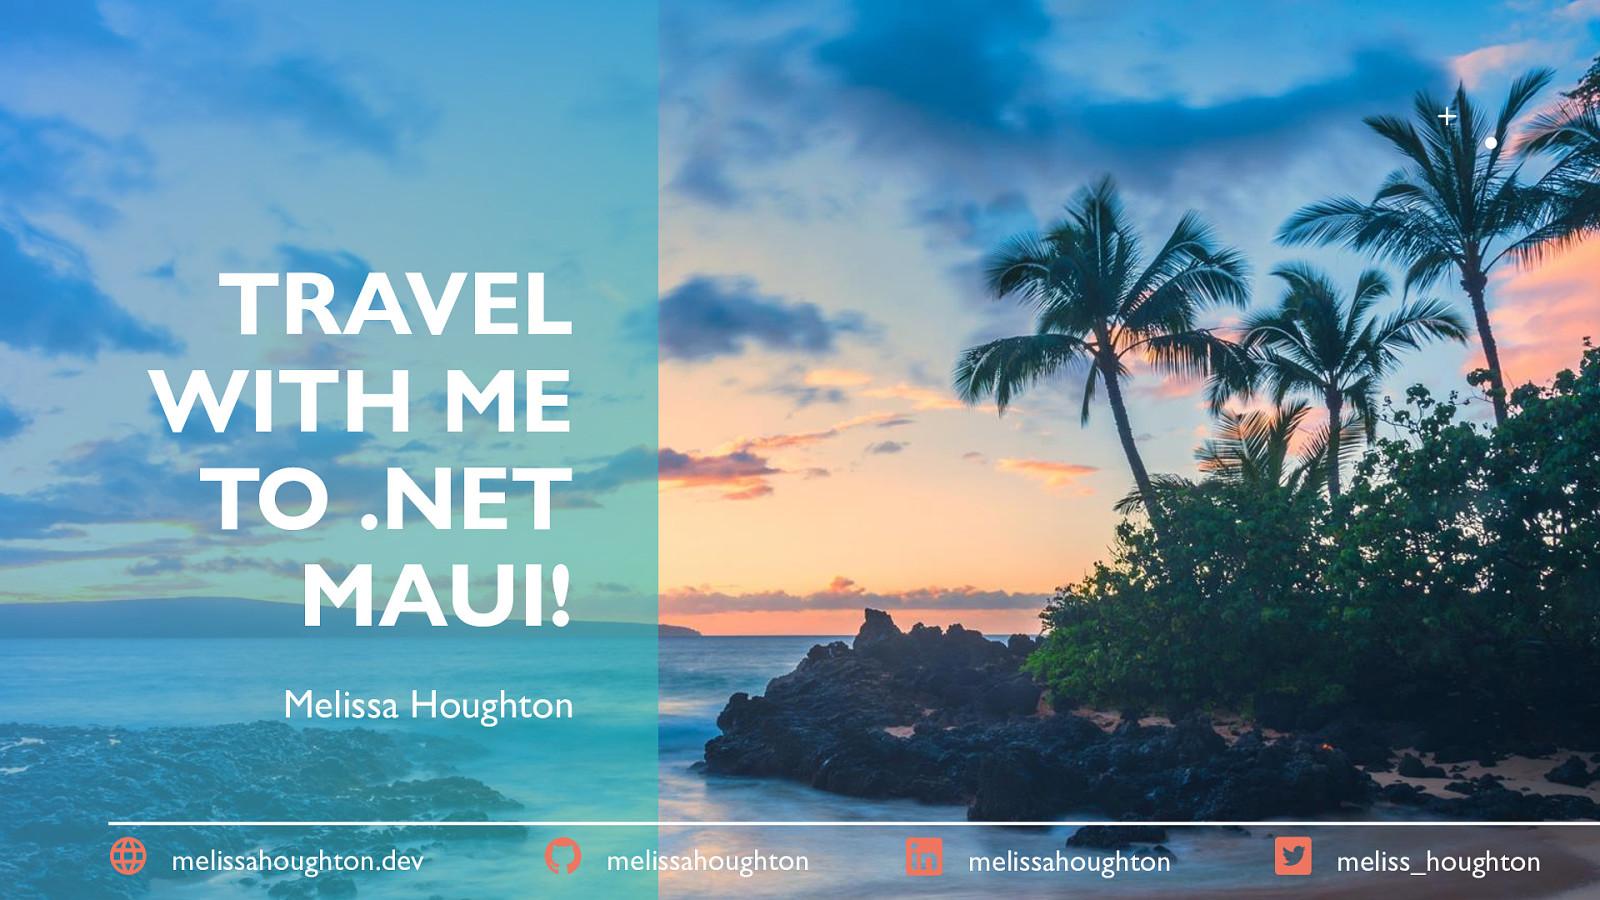 Travel with me to .NET MAUI!